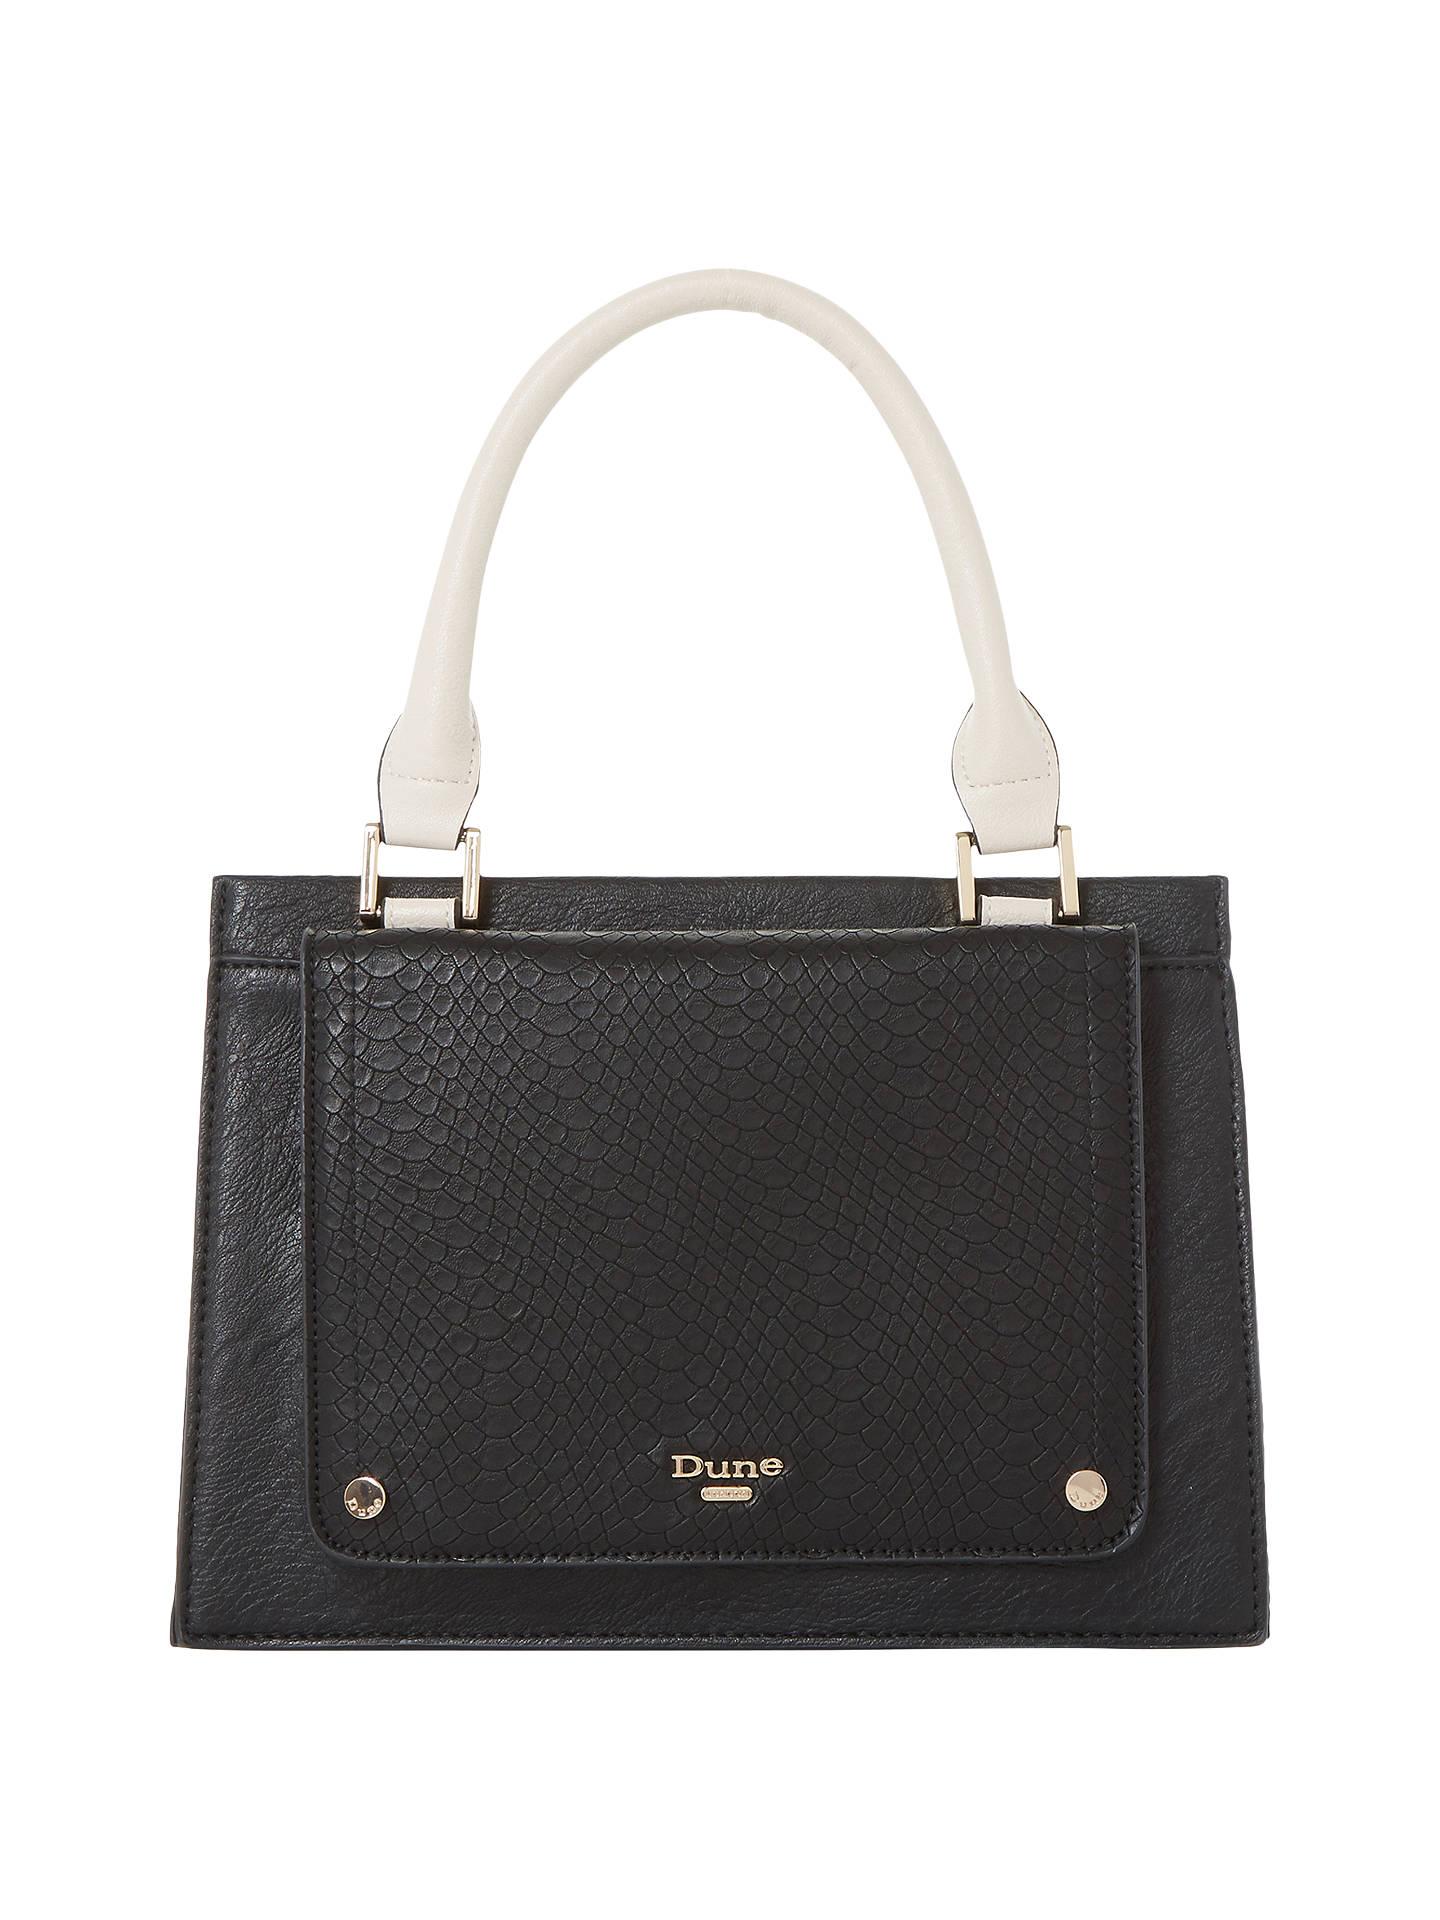 Dune Dinidophie Mini Grab Bag Black Online At Johnlewis